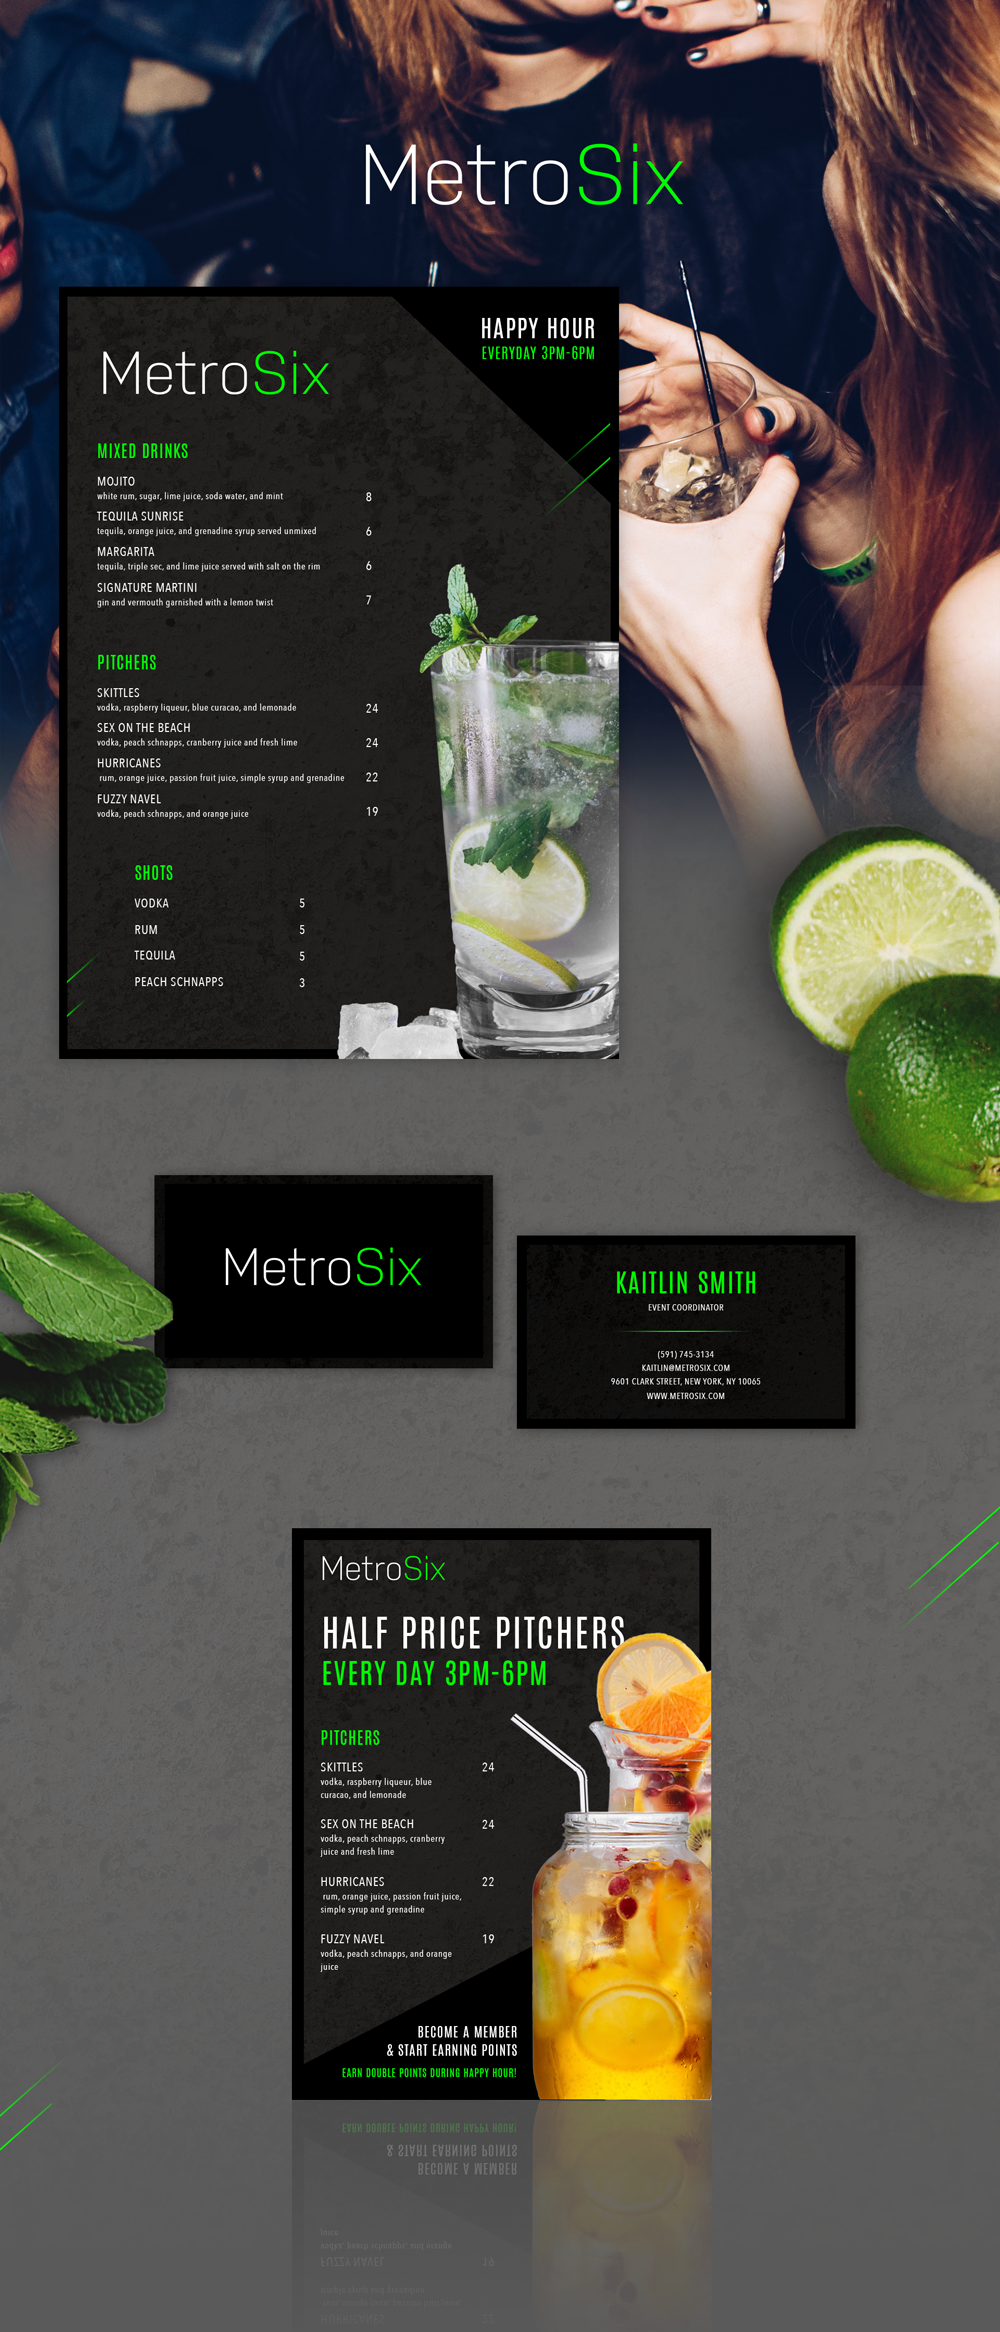 MetroSix   brand identity